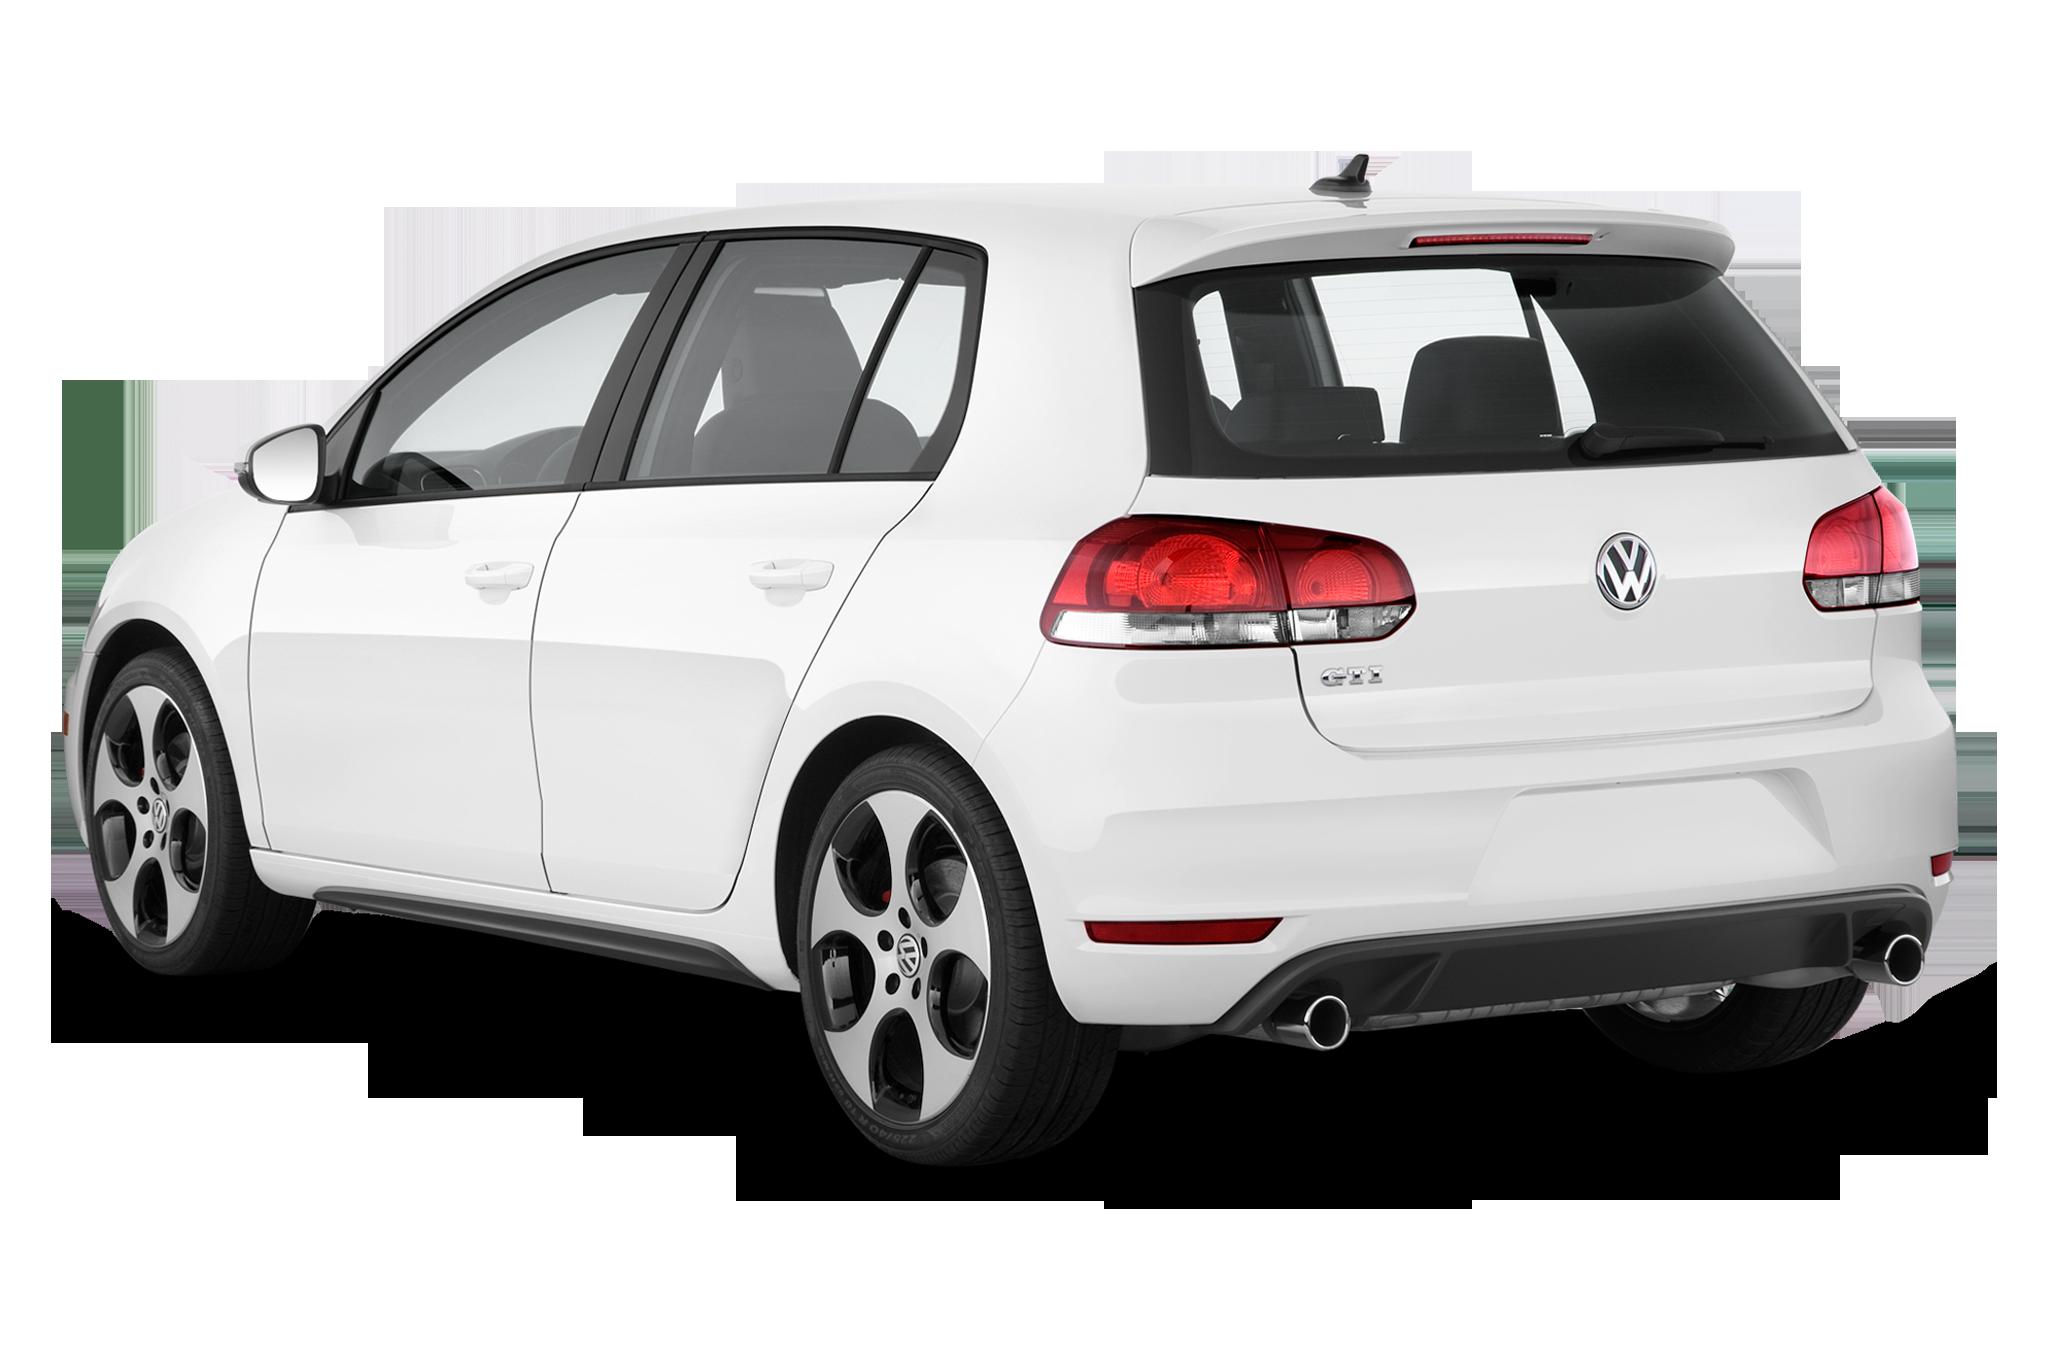 2010 Volkswagen Golf GTI - 2009 Sneak Preview Review - Automobile ...